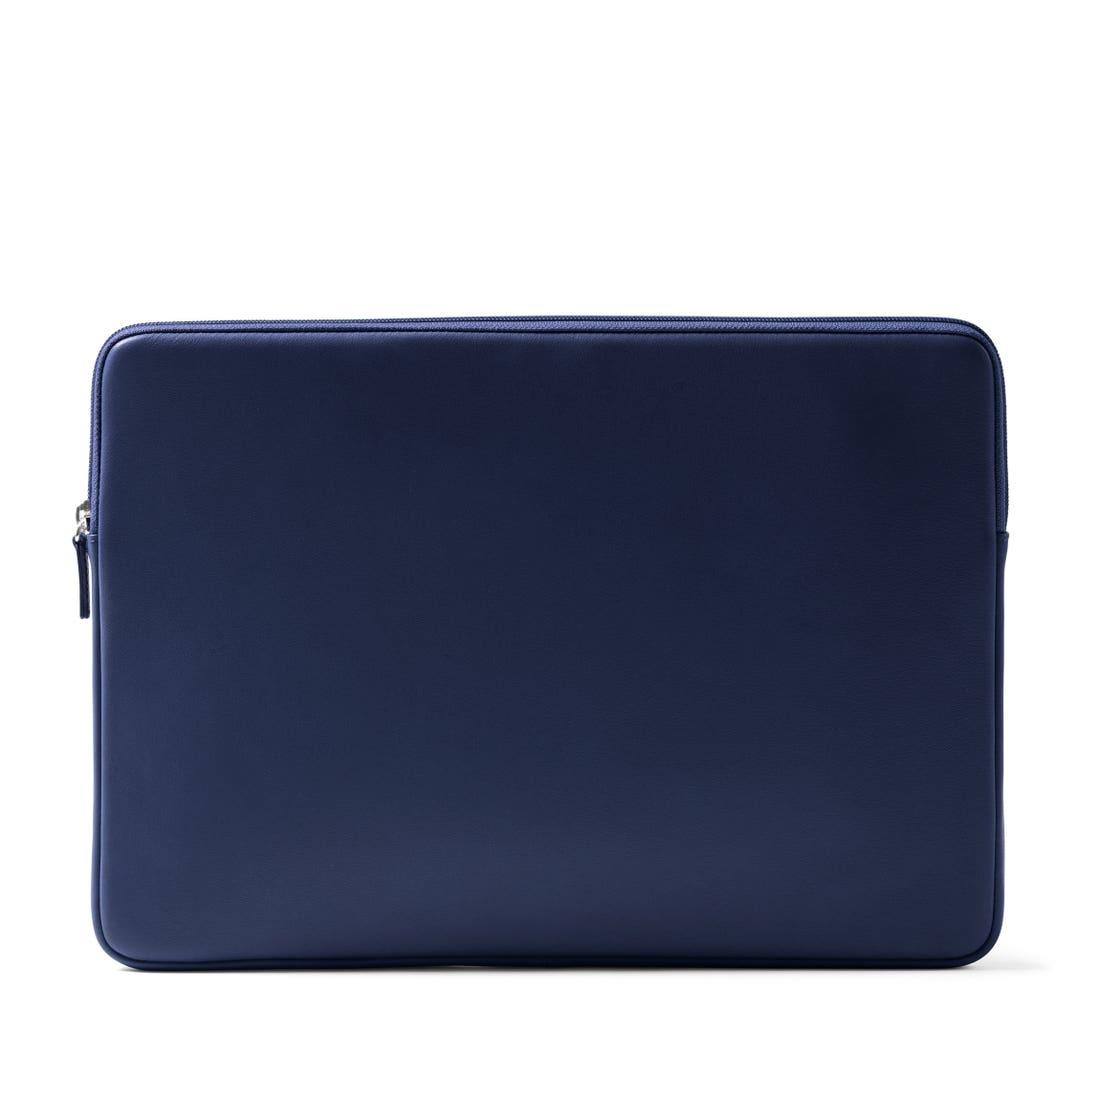 15/16 Inch Slim Laptop Sleeve